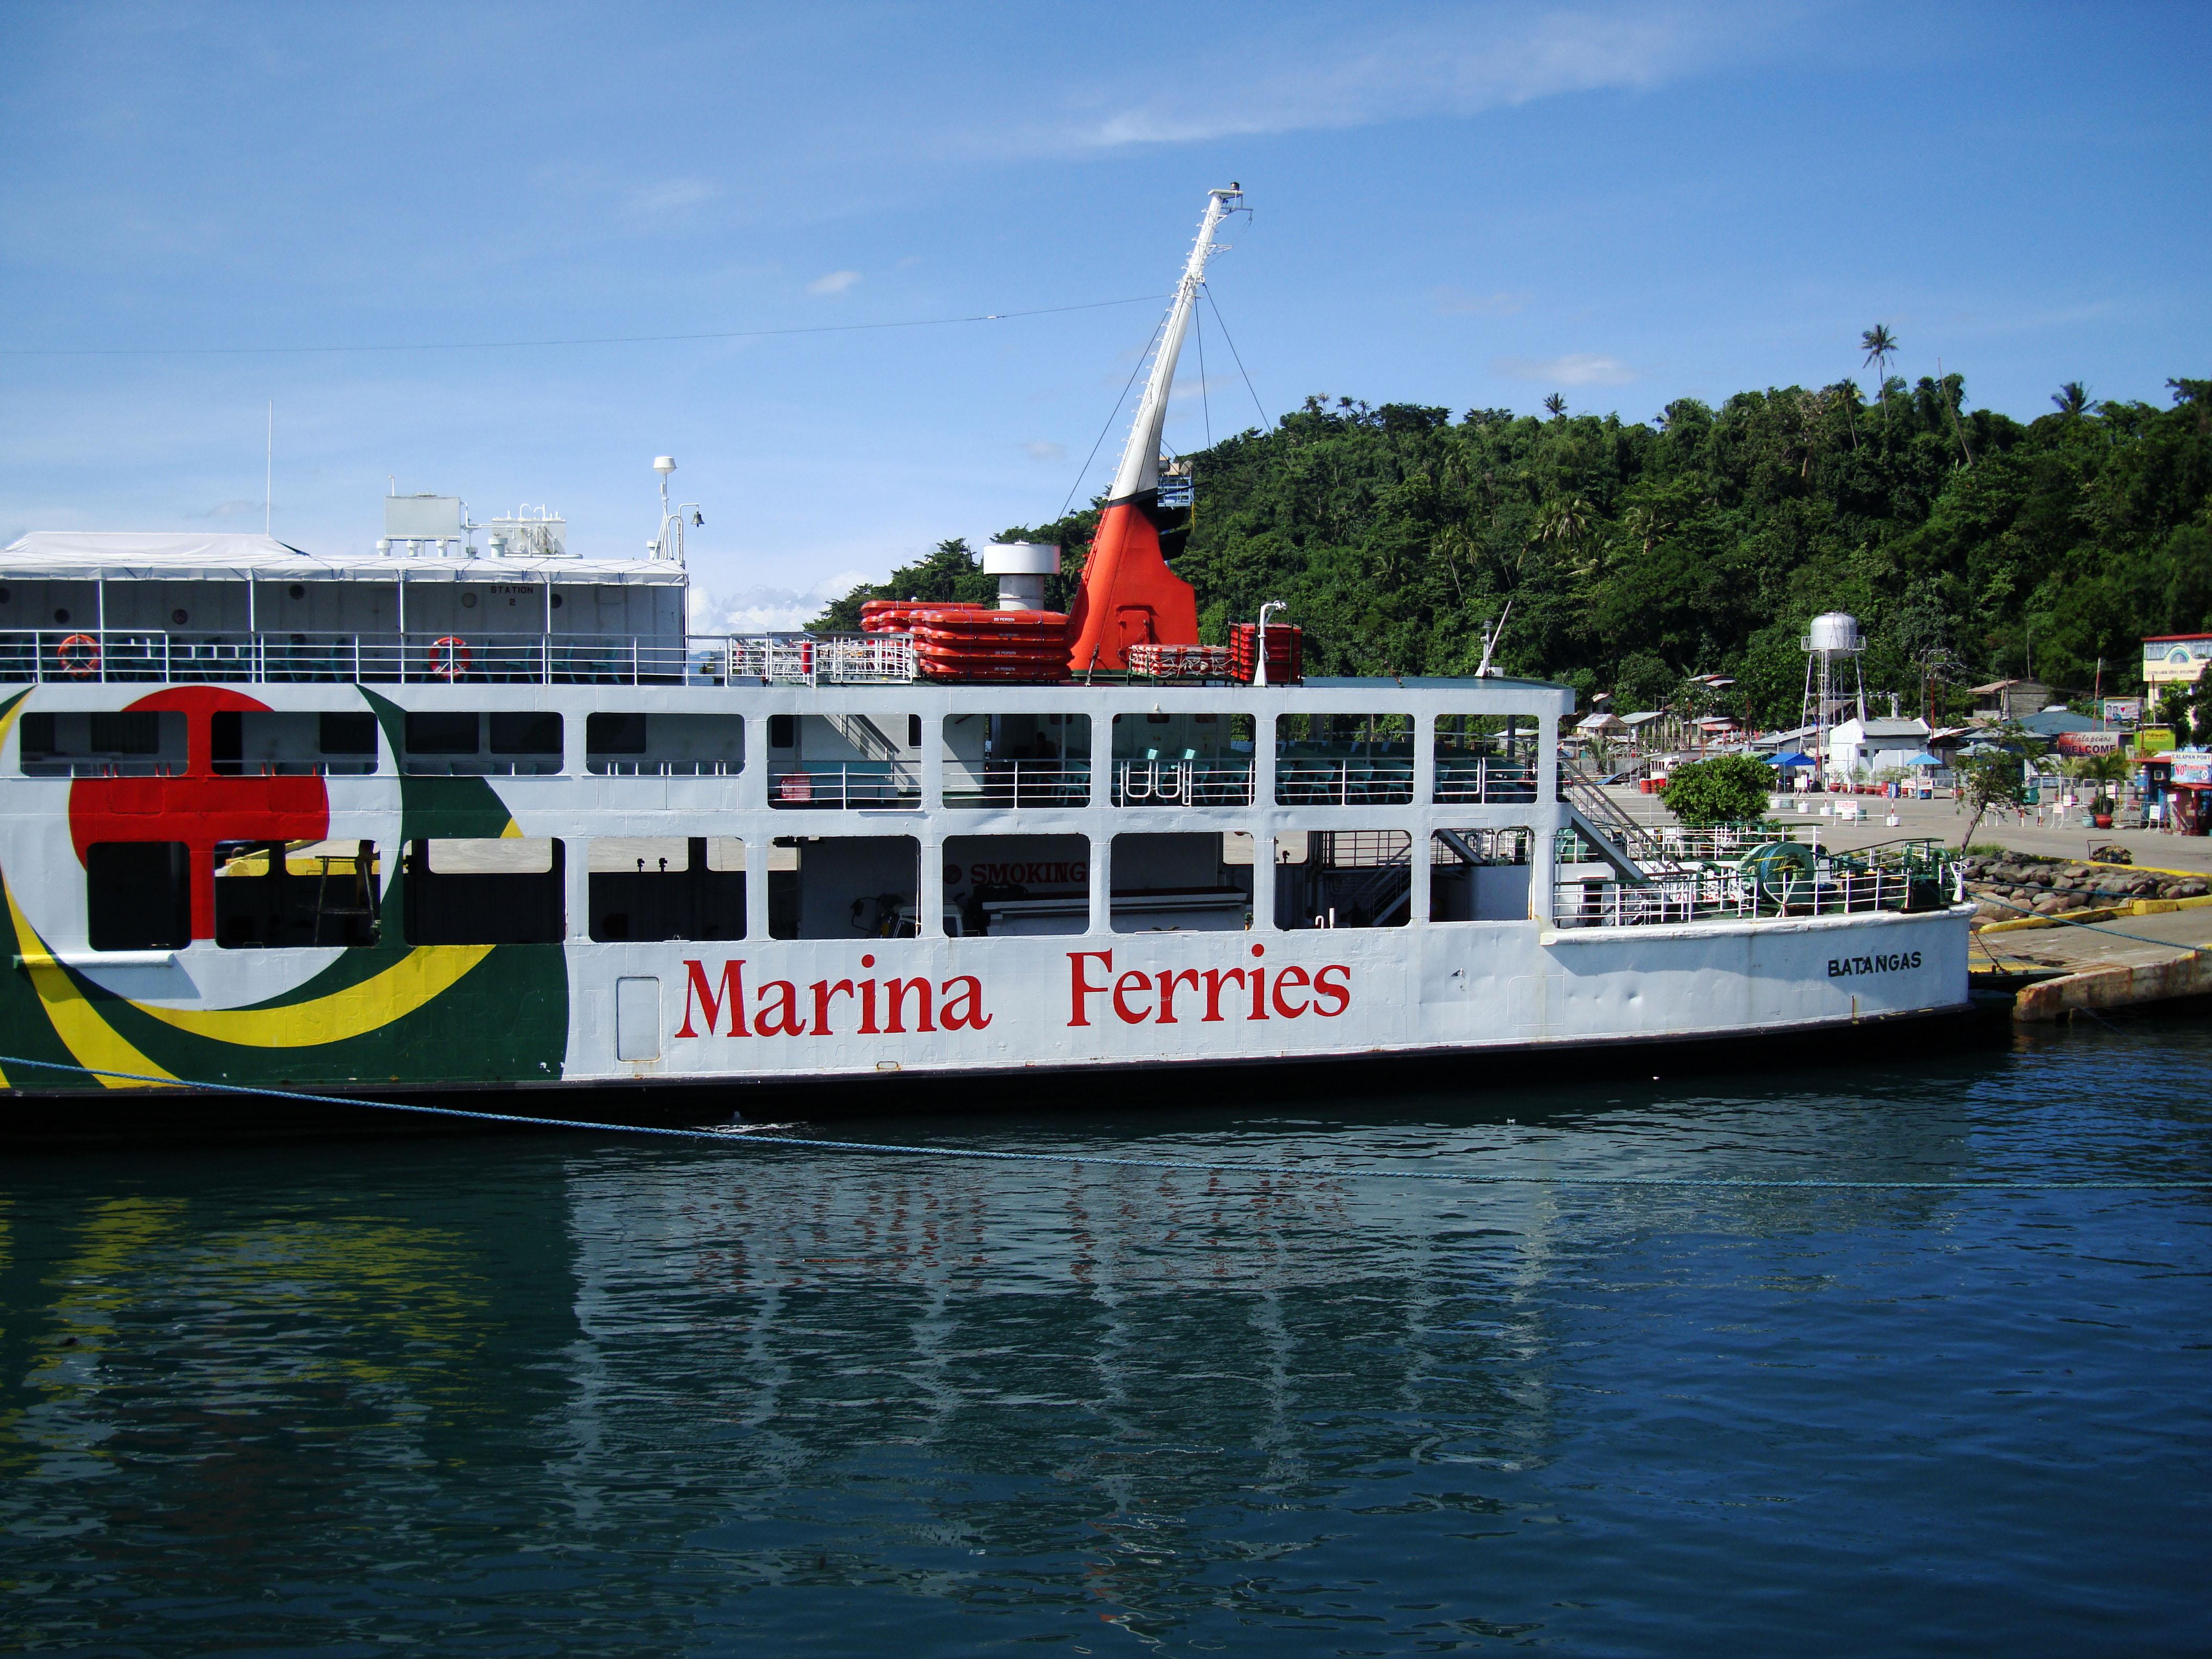 MV Reina Del Cielo Montenegro lines Calapan Pier Philippines 04